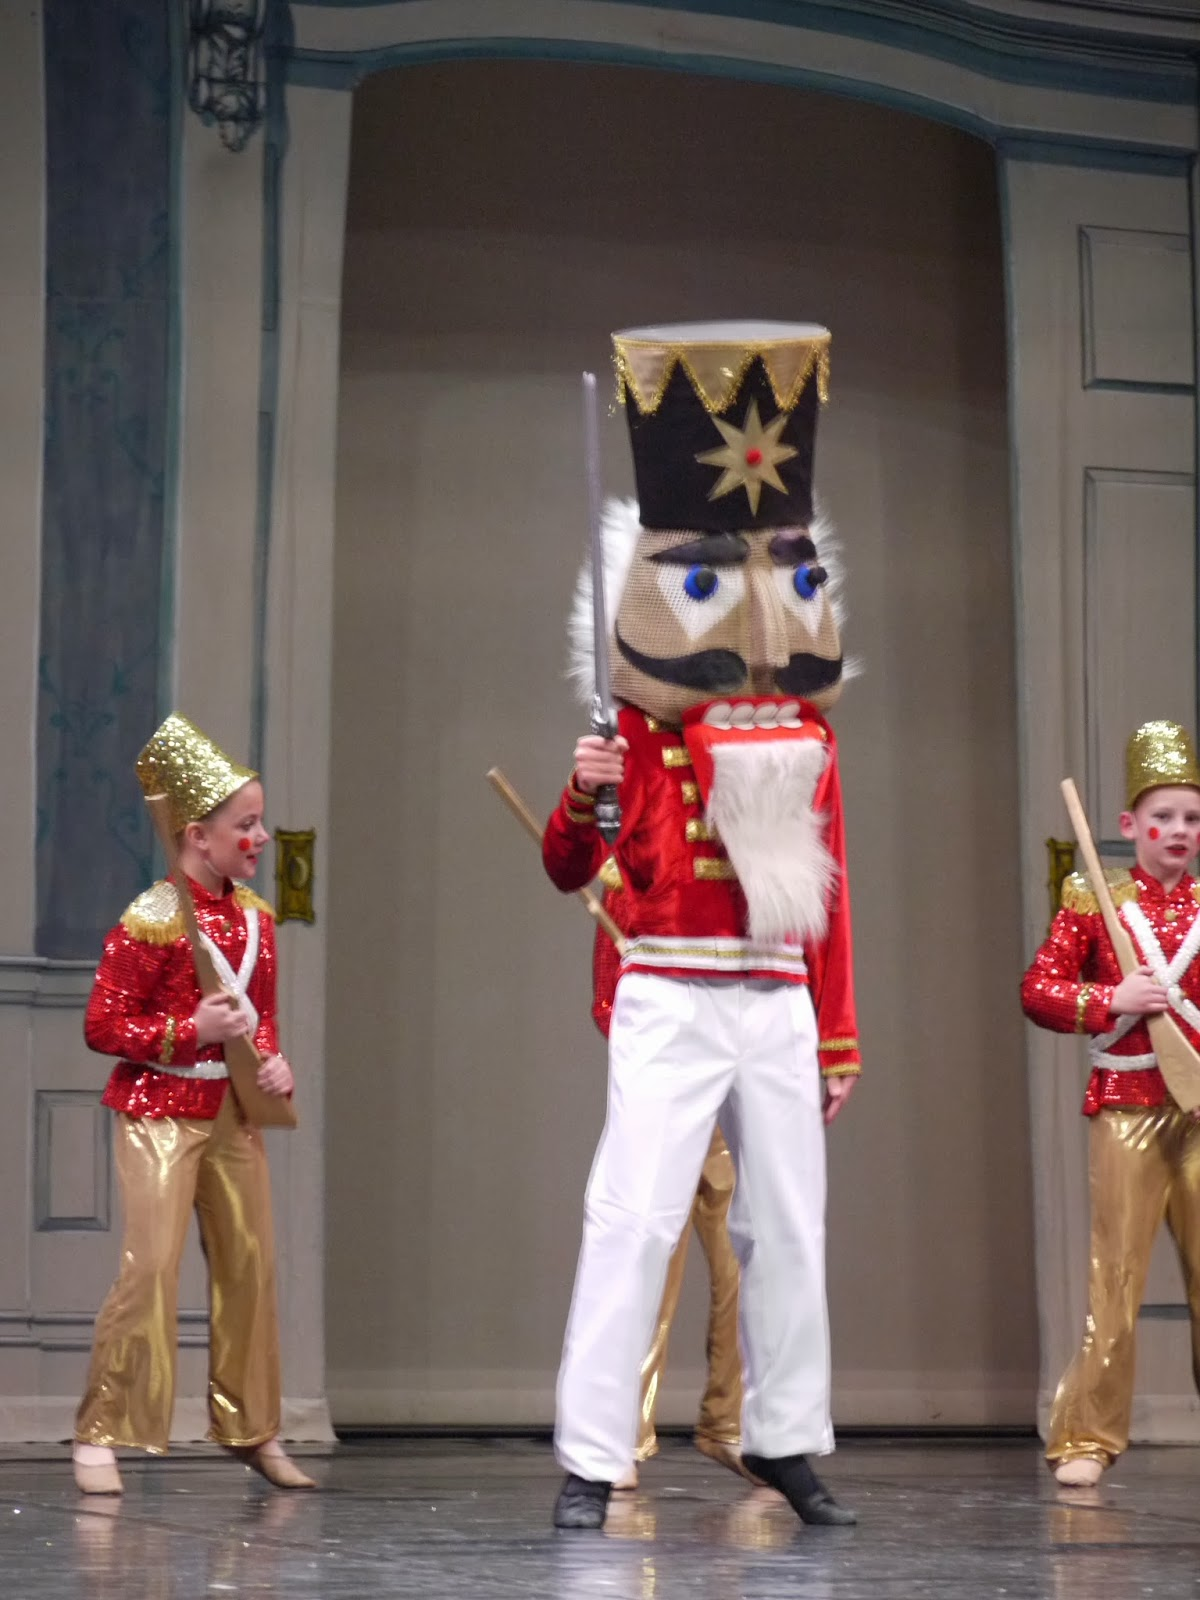 Full Nutcracker ballet costume with jacket